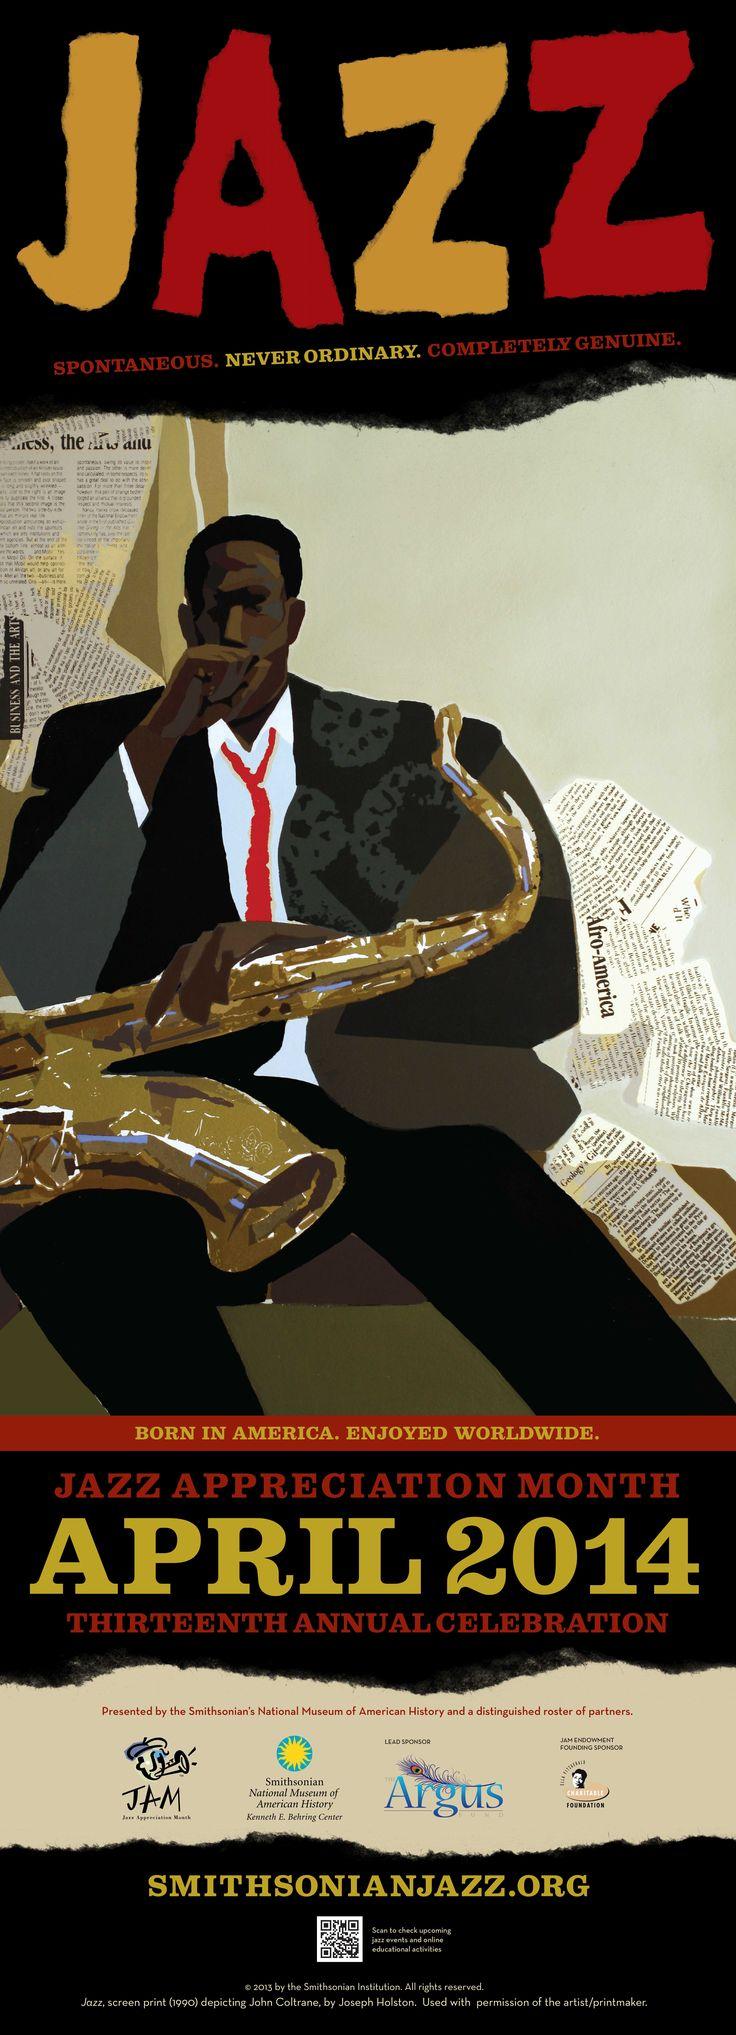 JAZZRADIO.com - enjoy great jazz music